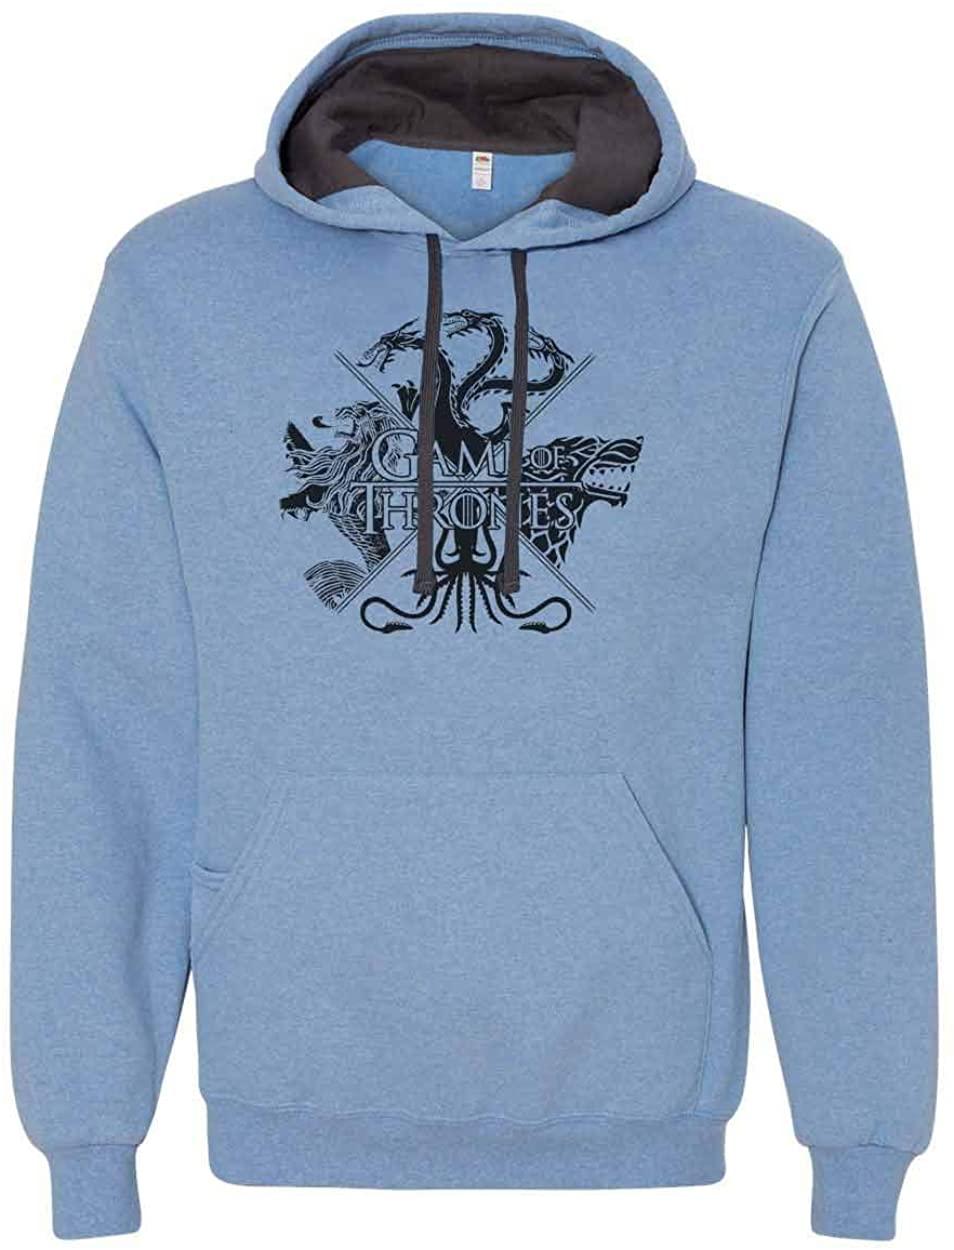 "Unisex Mens & Womens Hoodie - Very Soft Game of Thrones"" Hooded Sweatshirt Large, North Carolina Blue"